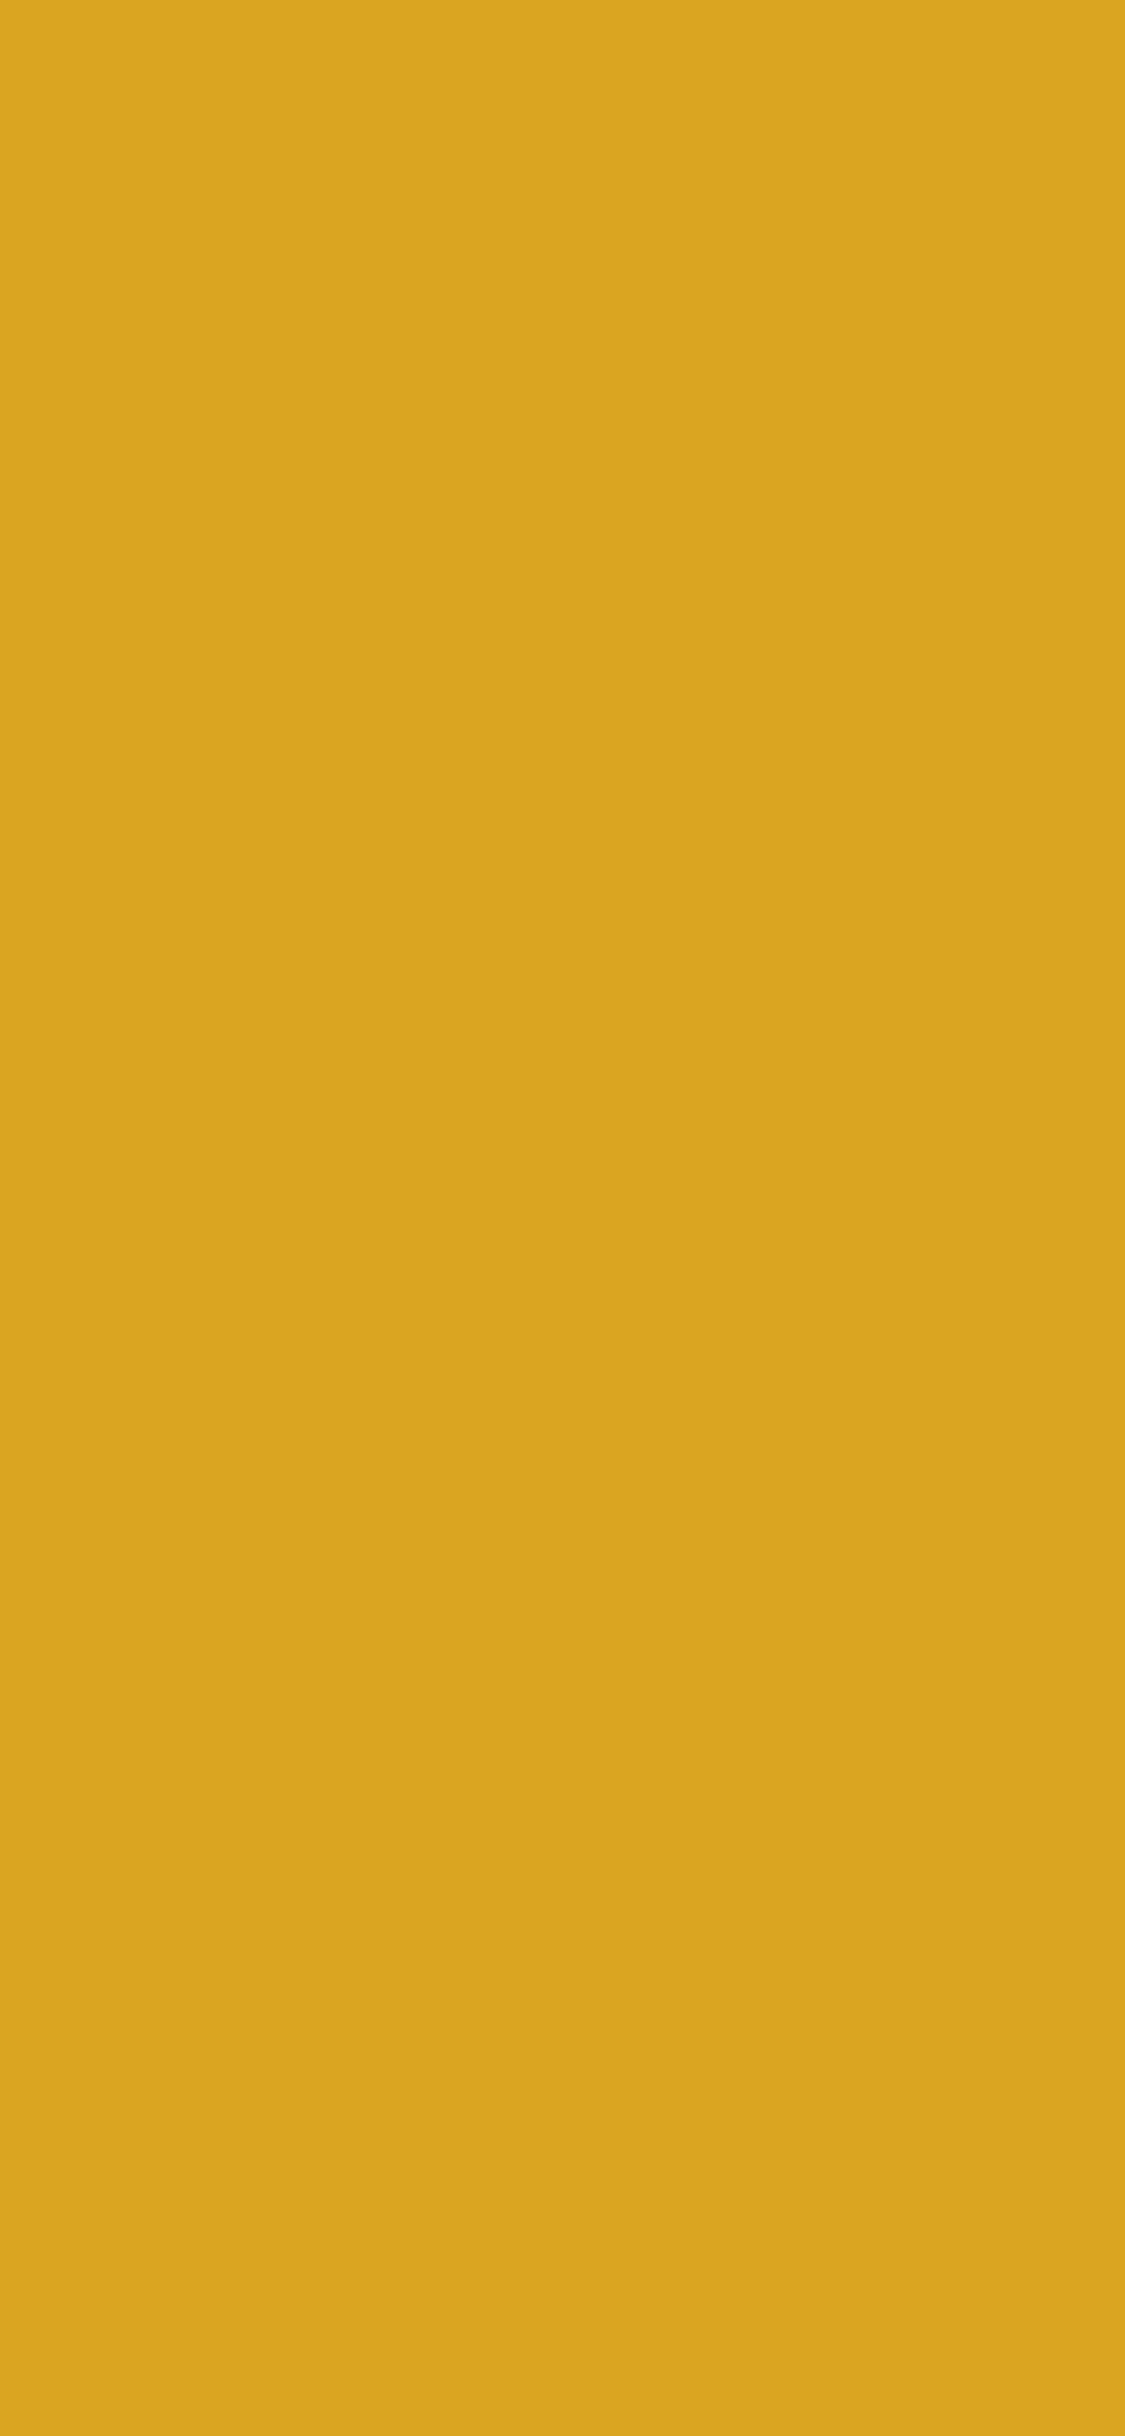 1125x2436 Goldenrod Solid Color Background